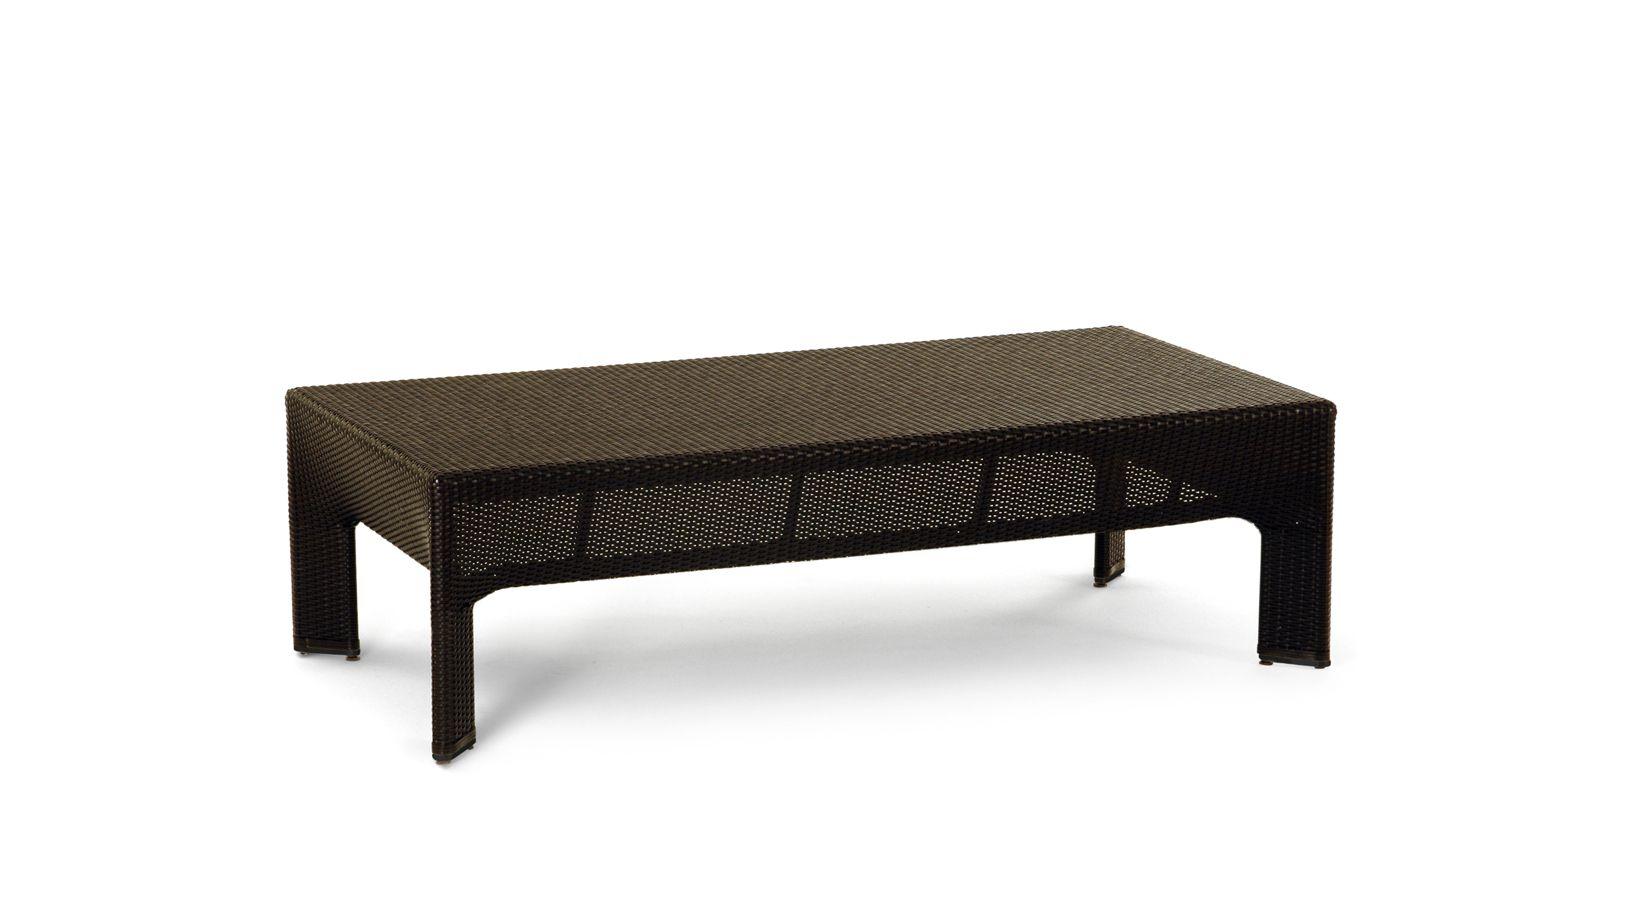 Bel air corner composition roche bobois - Table basse roche bobois prix ...